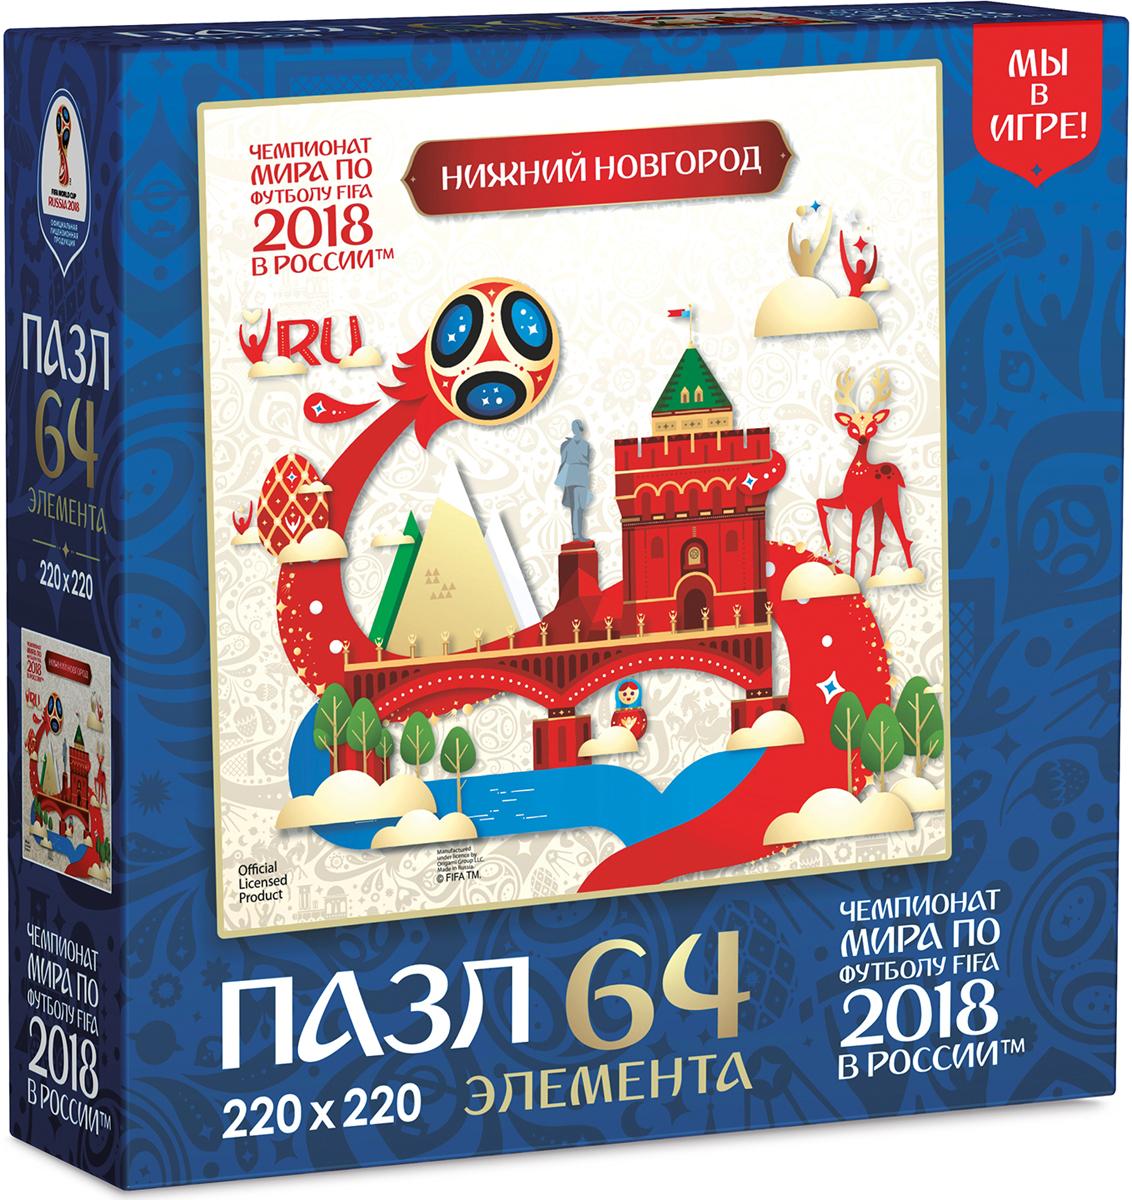 FIFA World Cup Russia 2018 Пазл Look Нижний Новгород 03878 цена и фото